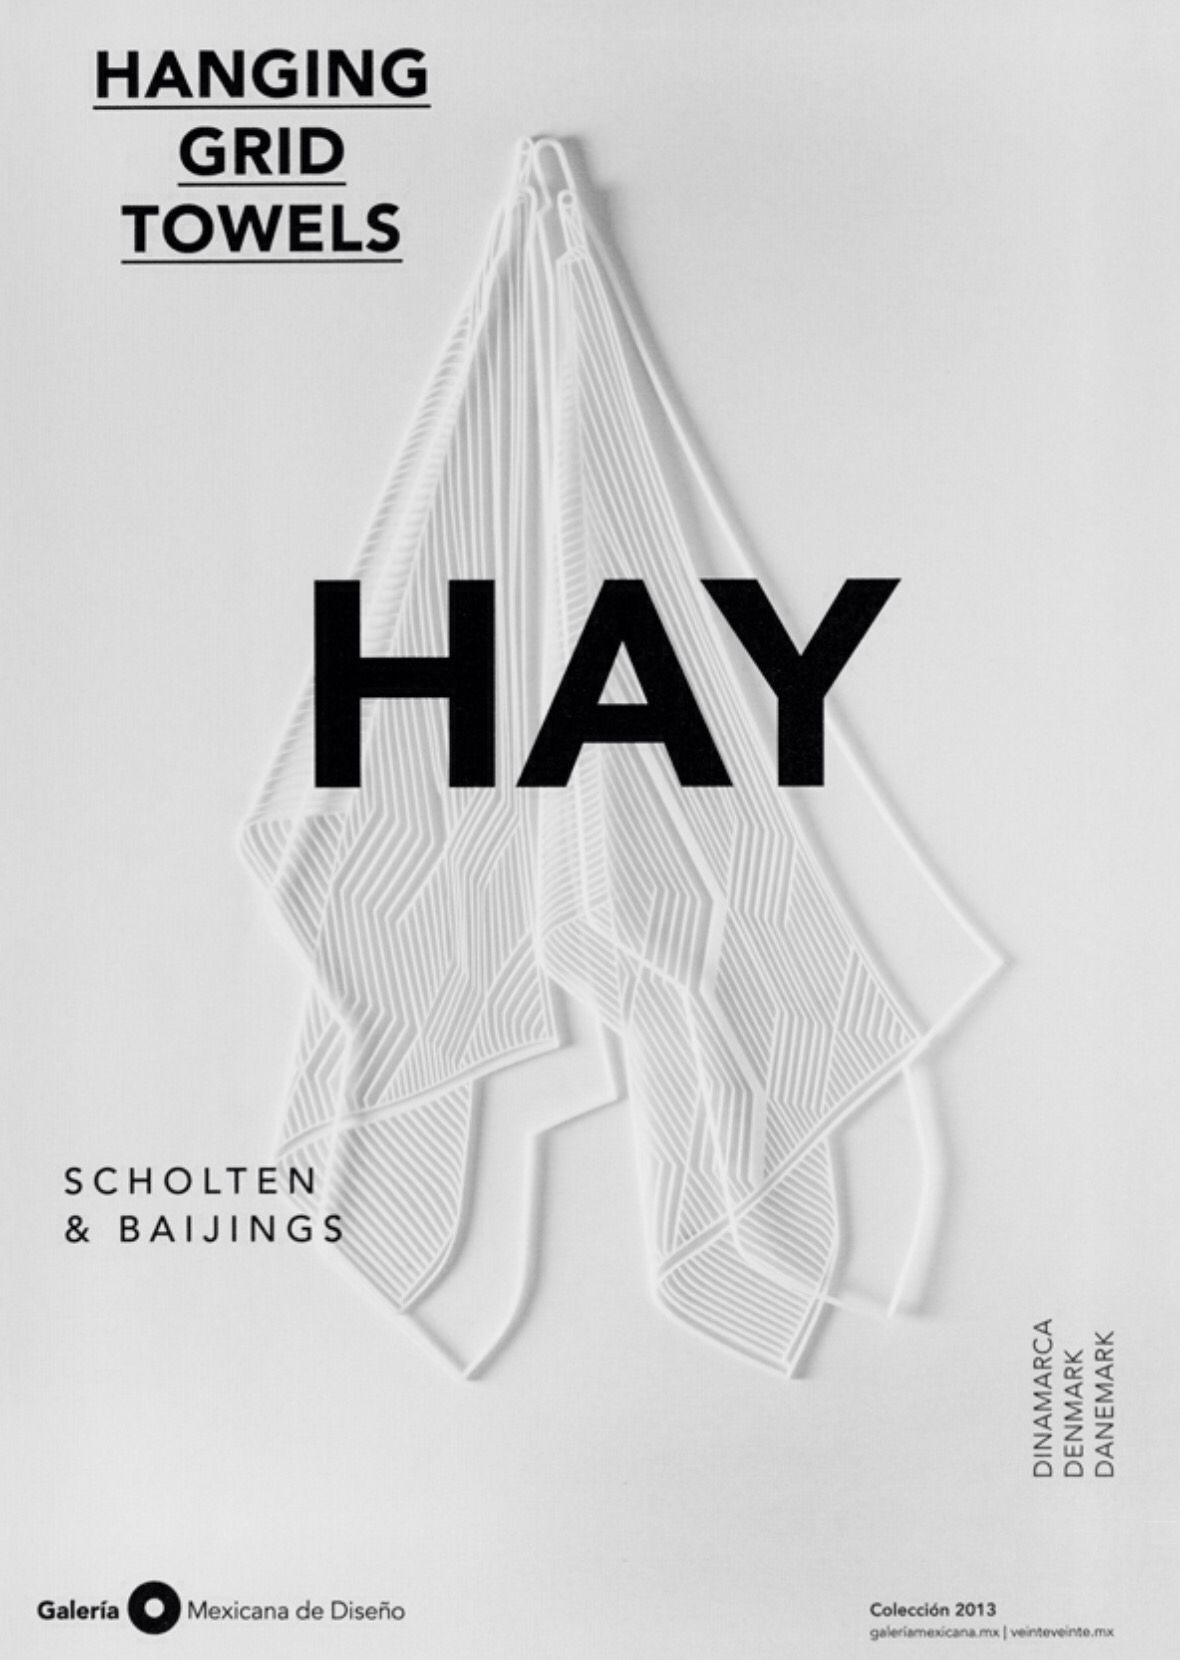 Dose Of Design Advertising Posters For Galeria Mexicana De